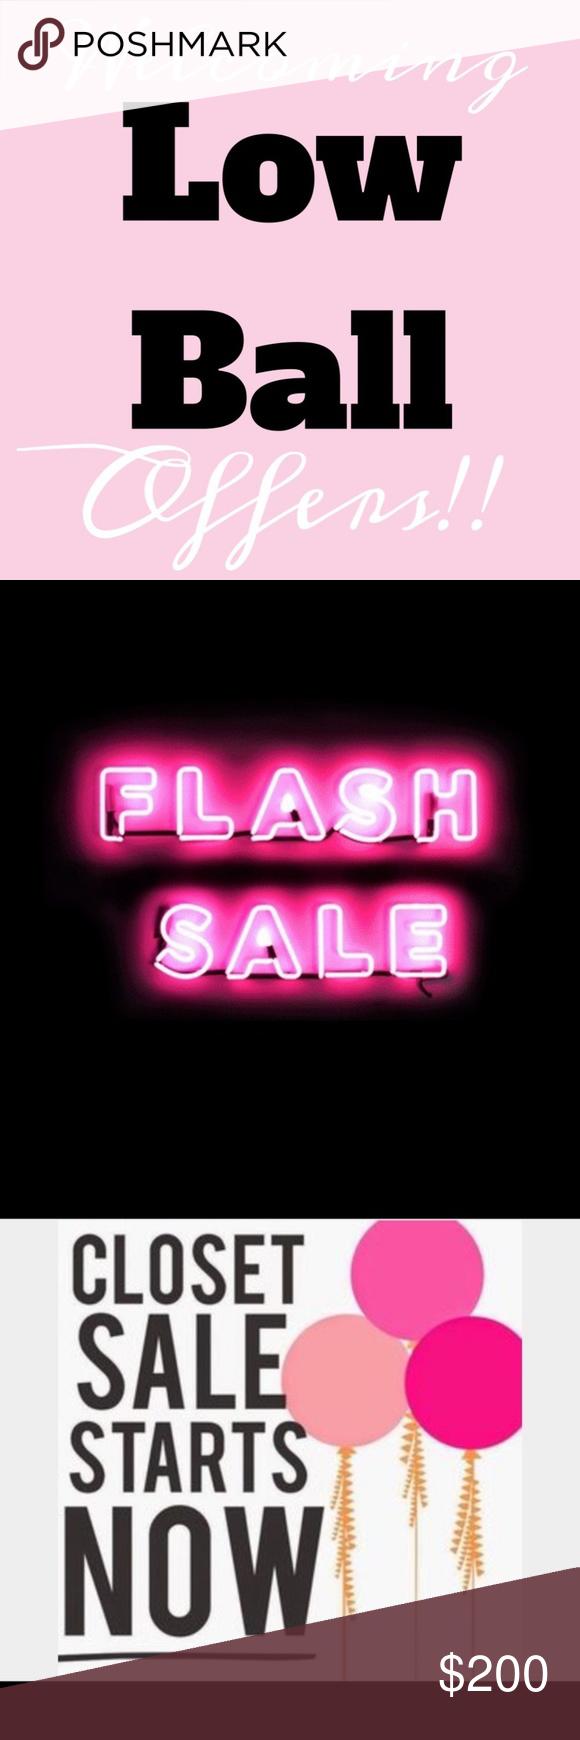 I Just Added This Listing On Poshmark Closet On Mass Sale Plus